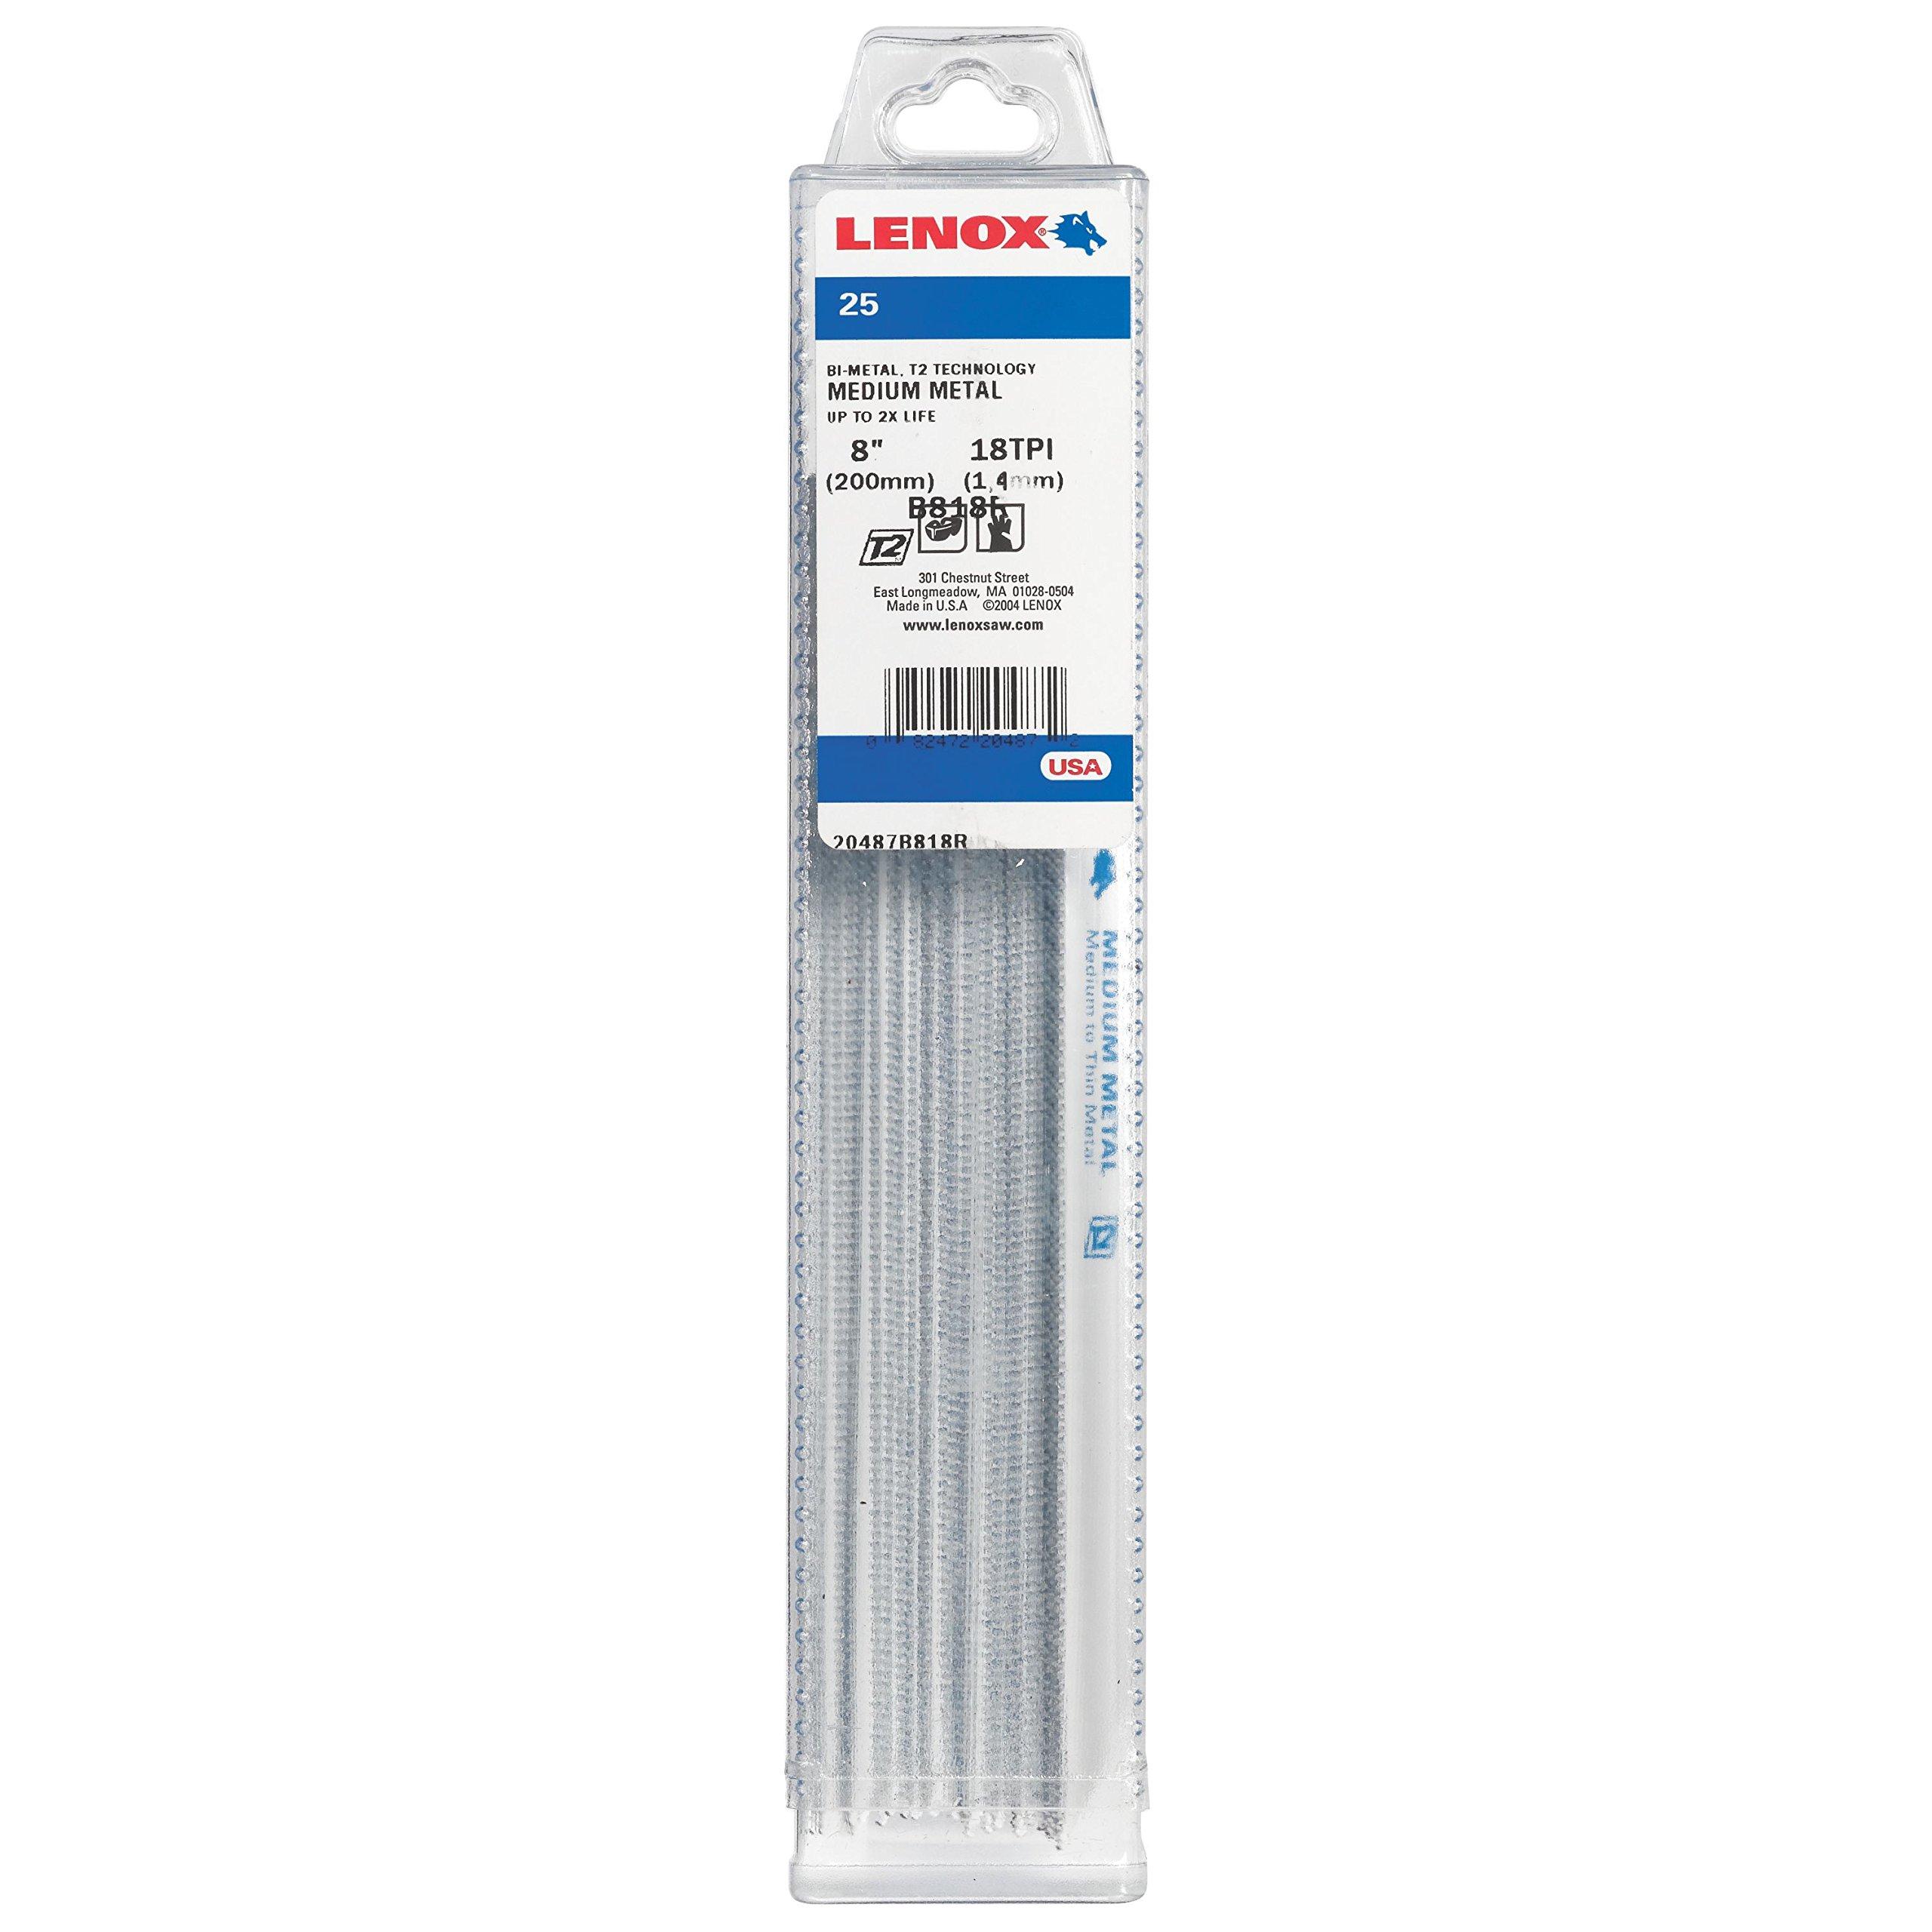 LENOX Tools Metal Cutting Reciprocating Saw Blade with Power Blast Technology, Bi-Metal, 8-inch, 18 TPI, 25/PK by Lenox Tools